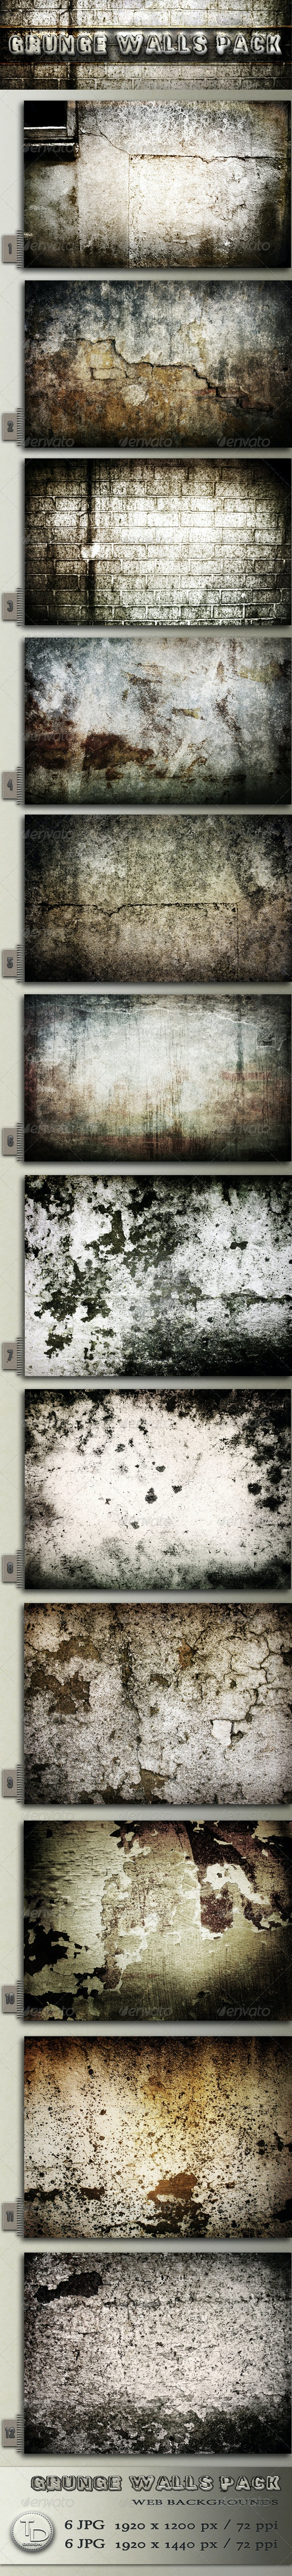 Grunge Walls Pack - Urban Backgrounds